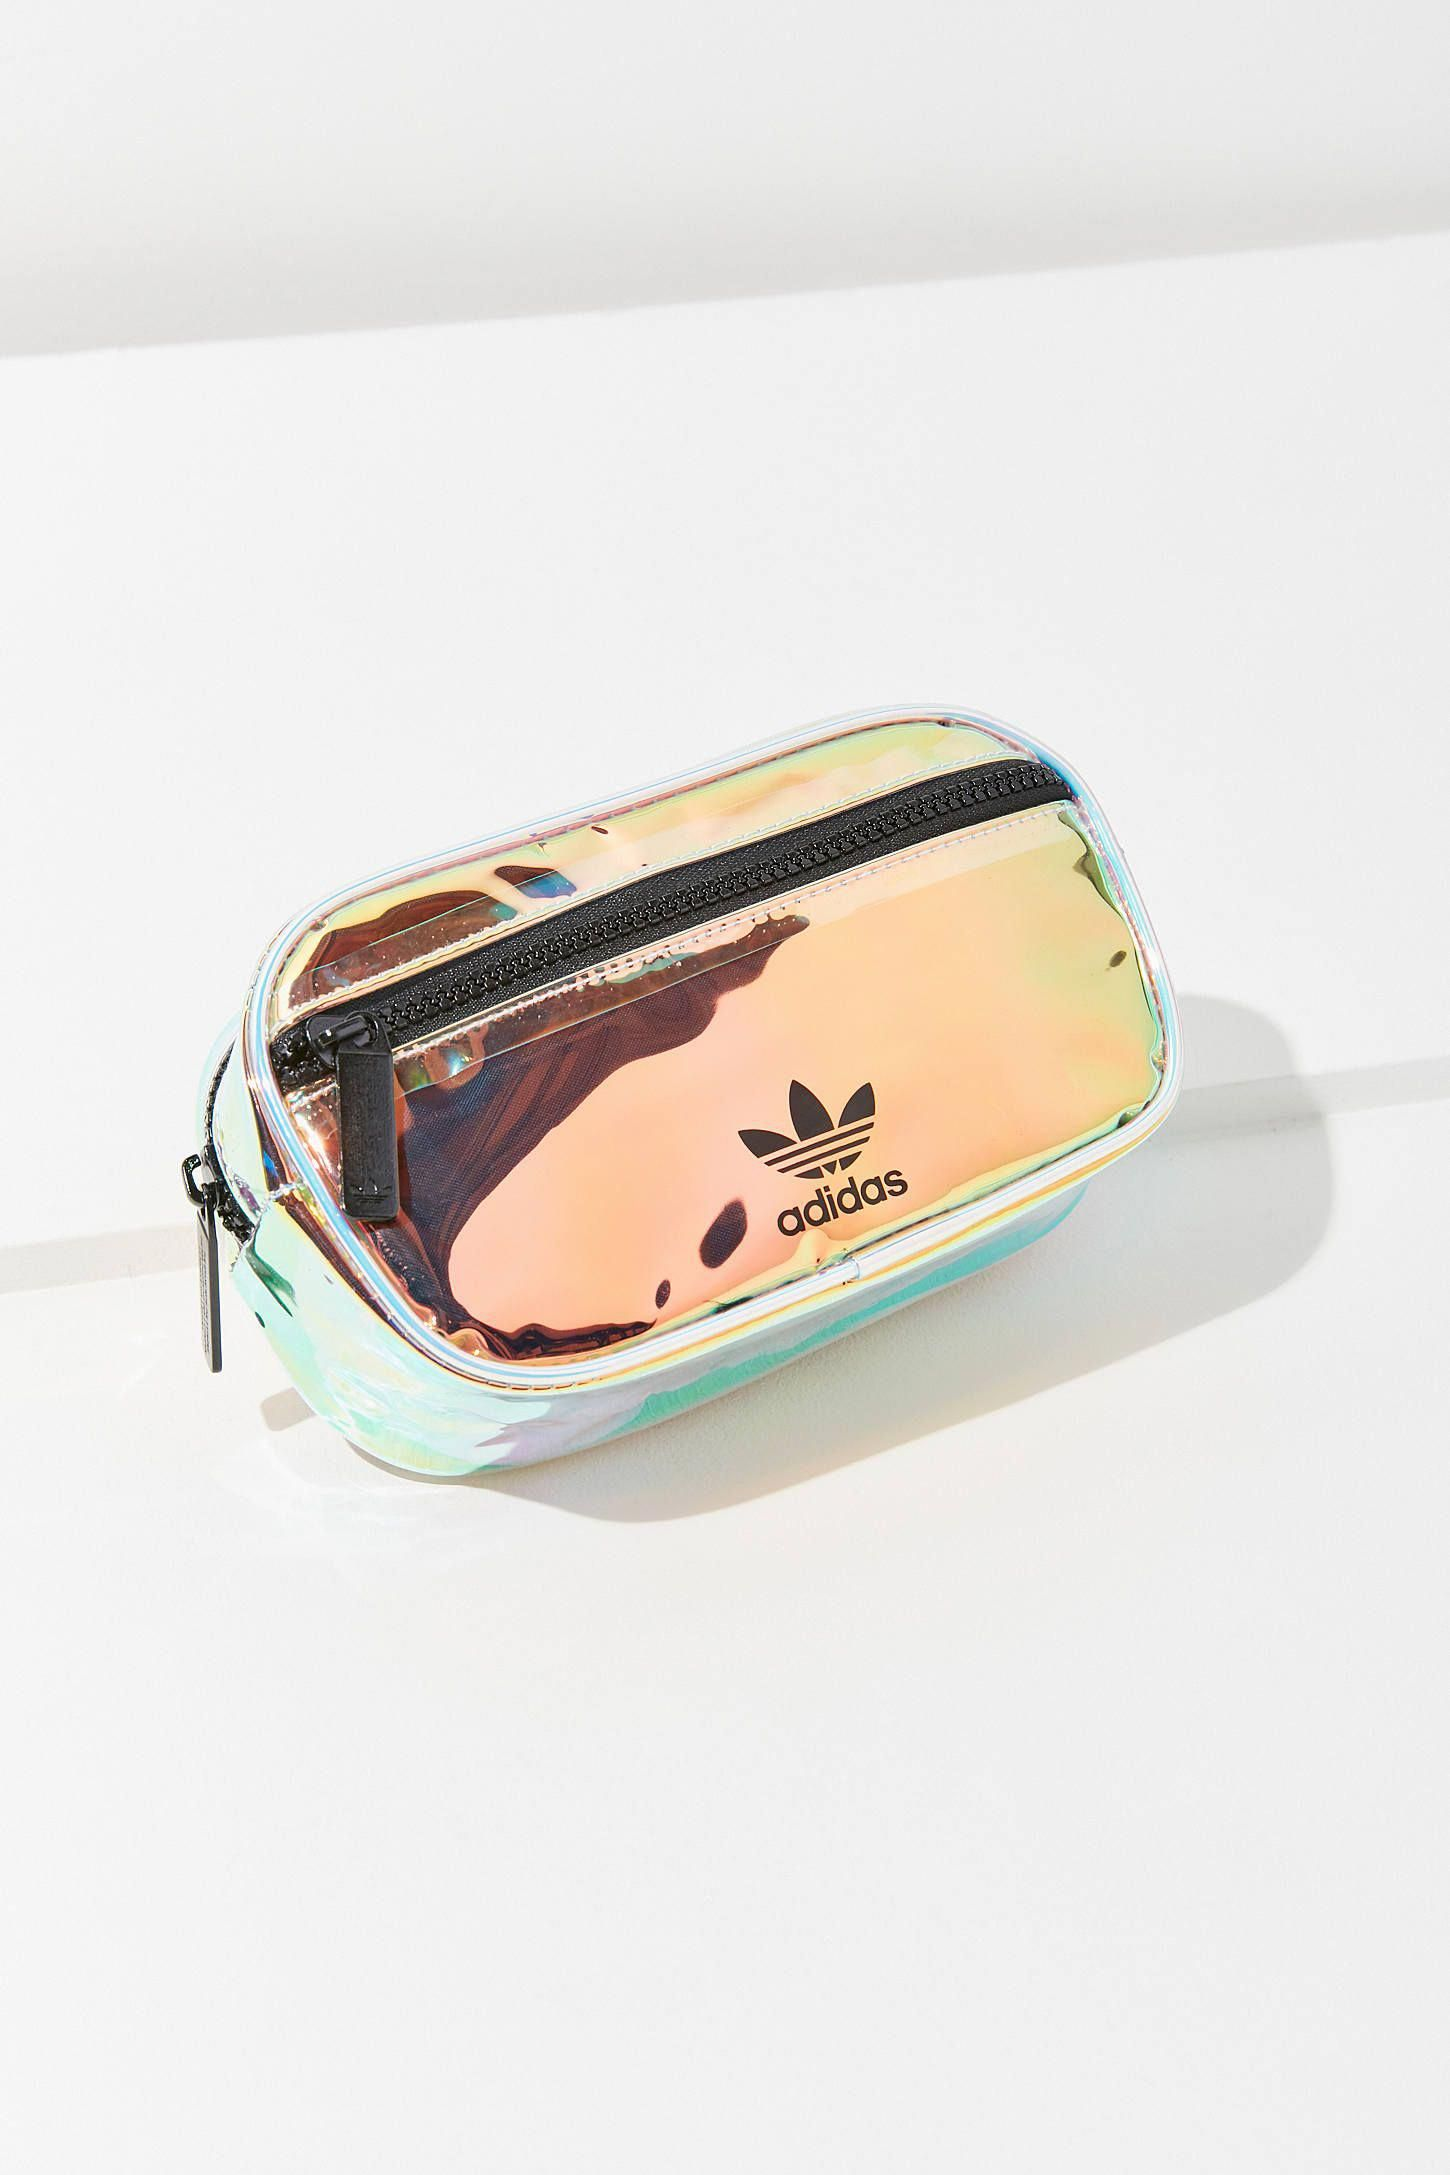 diario Inodoro celestial  adidas Originals Iridescent Belt Bag | Urban Outfitters | Mochila adidas  mujer, Mochila adidas, Mochilas hermosas